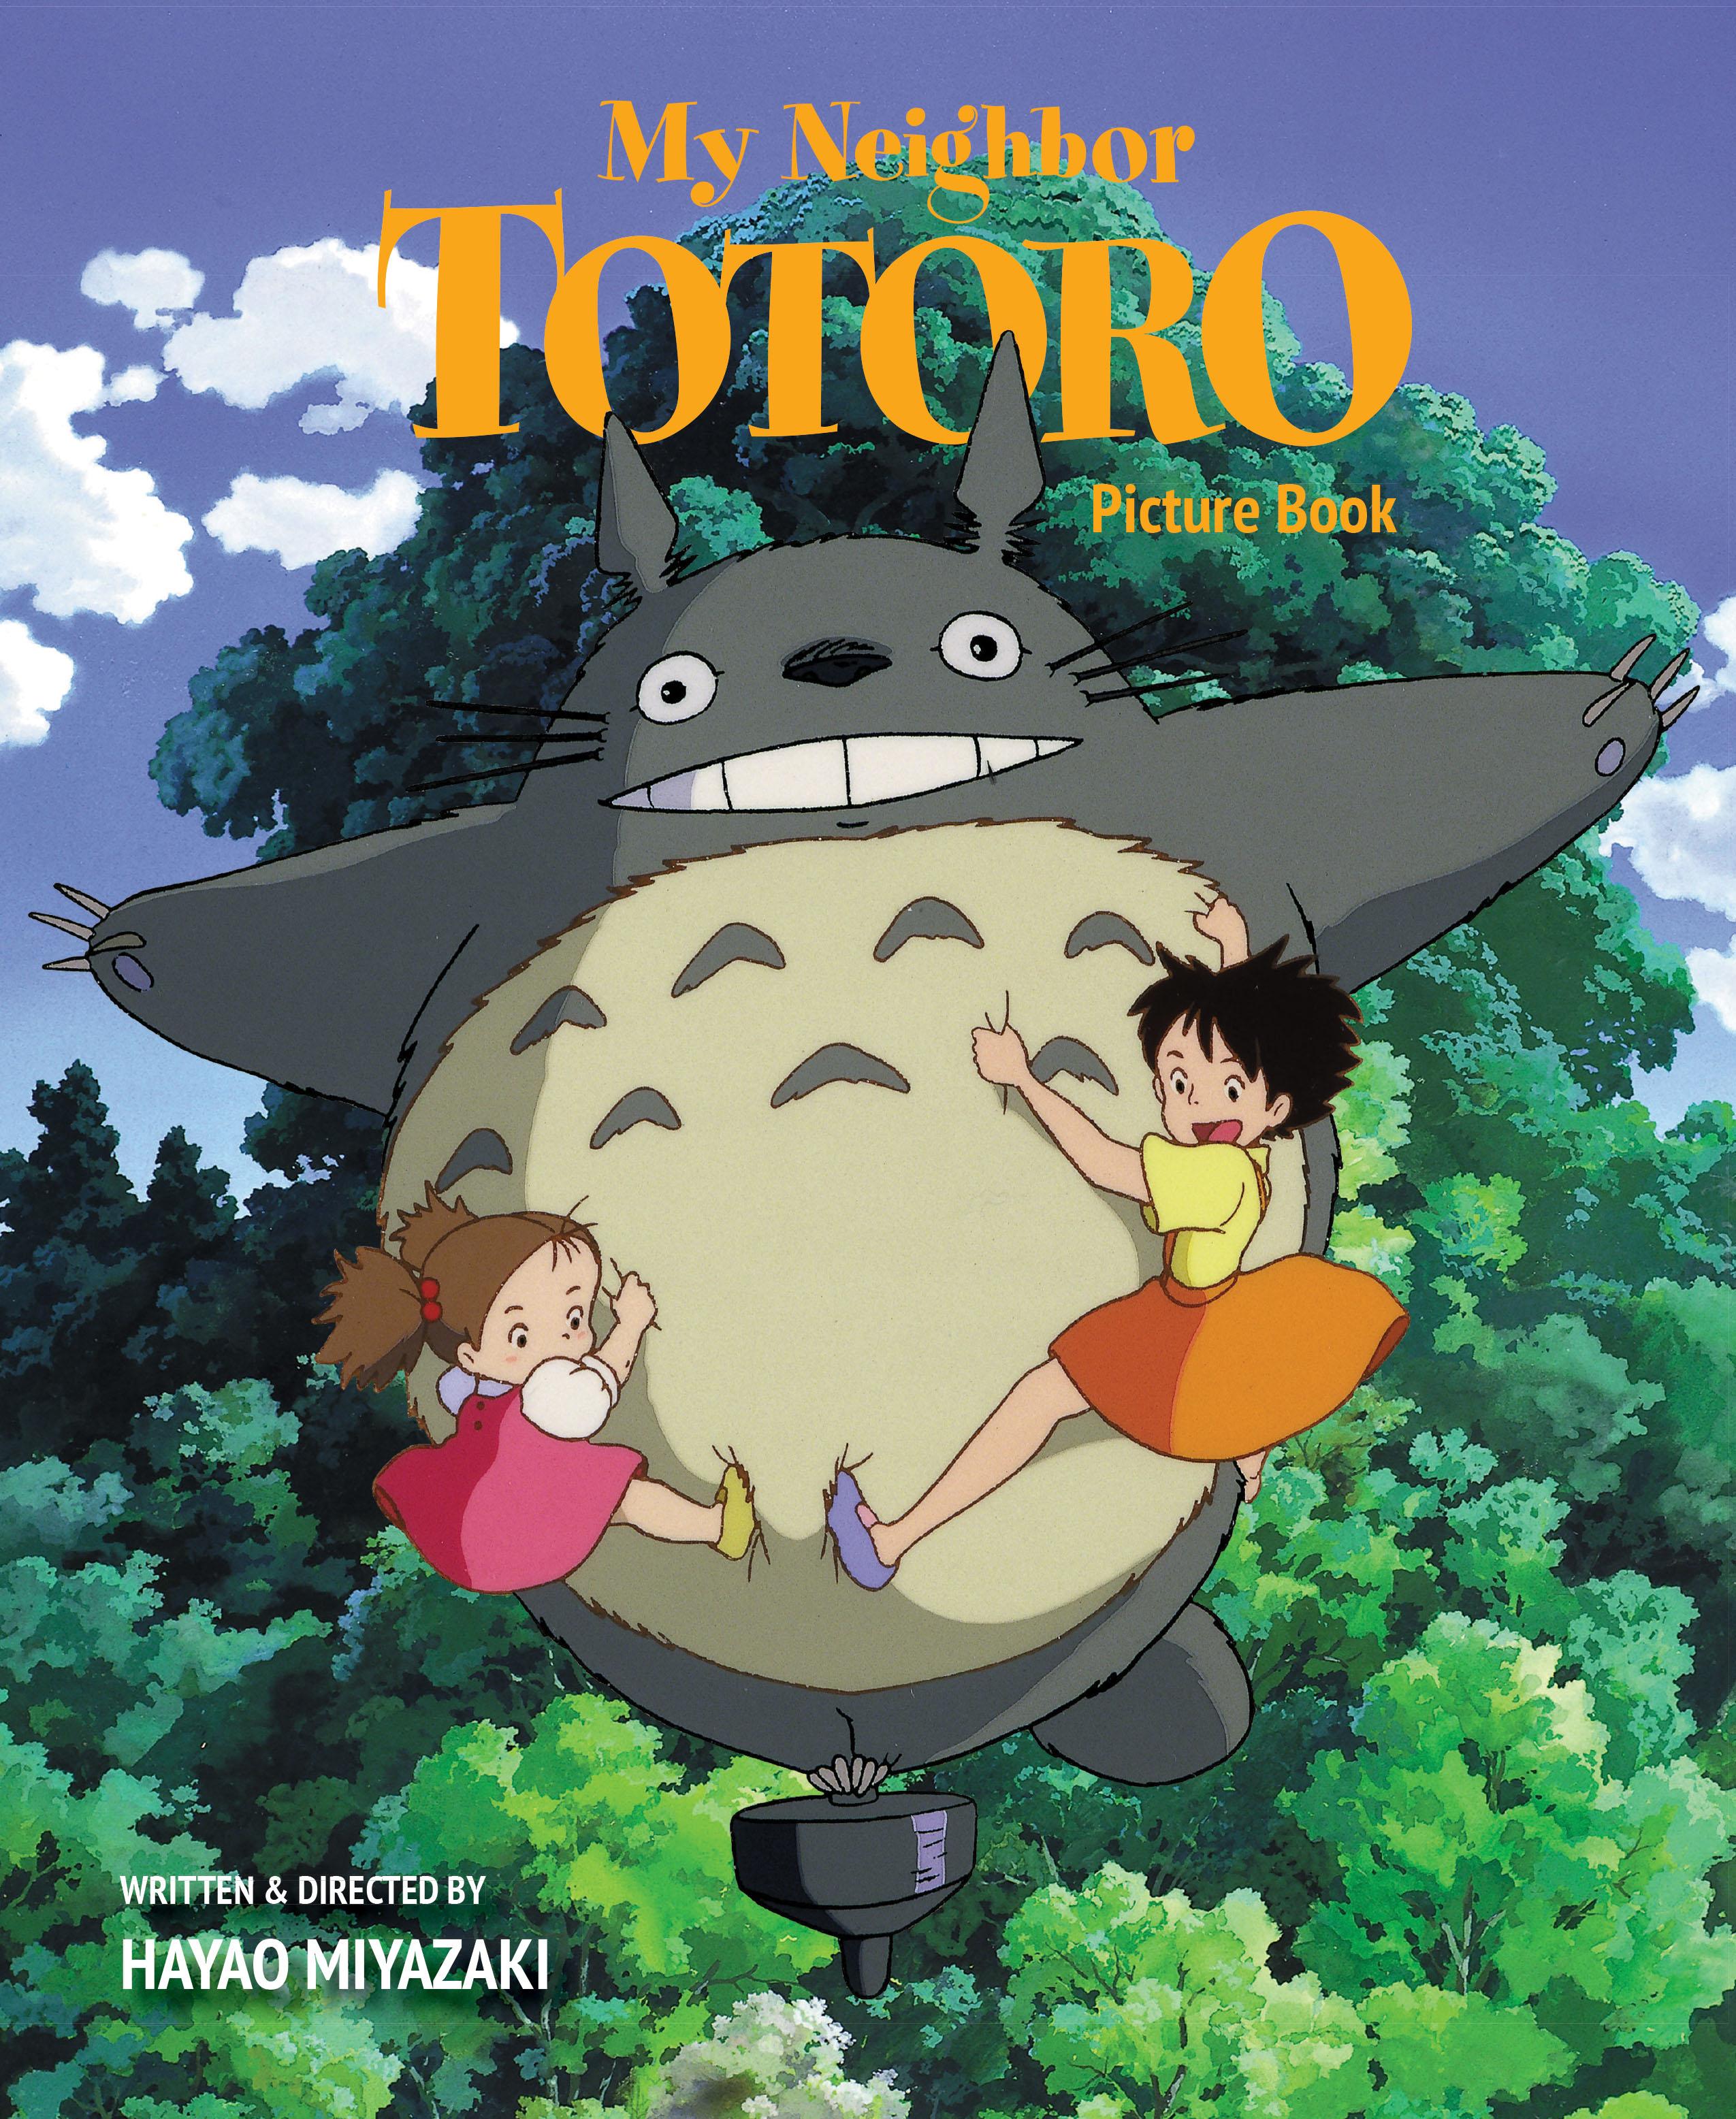 My Neighbor Totoro Wallpapers Movie Hq My Neighbor Totoro